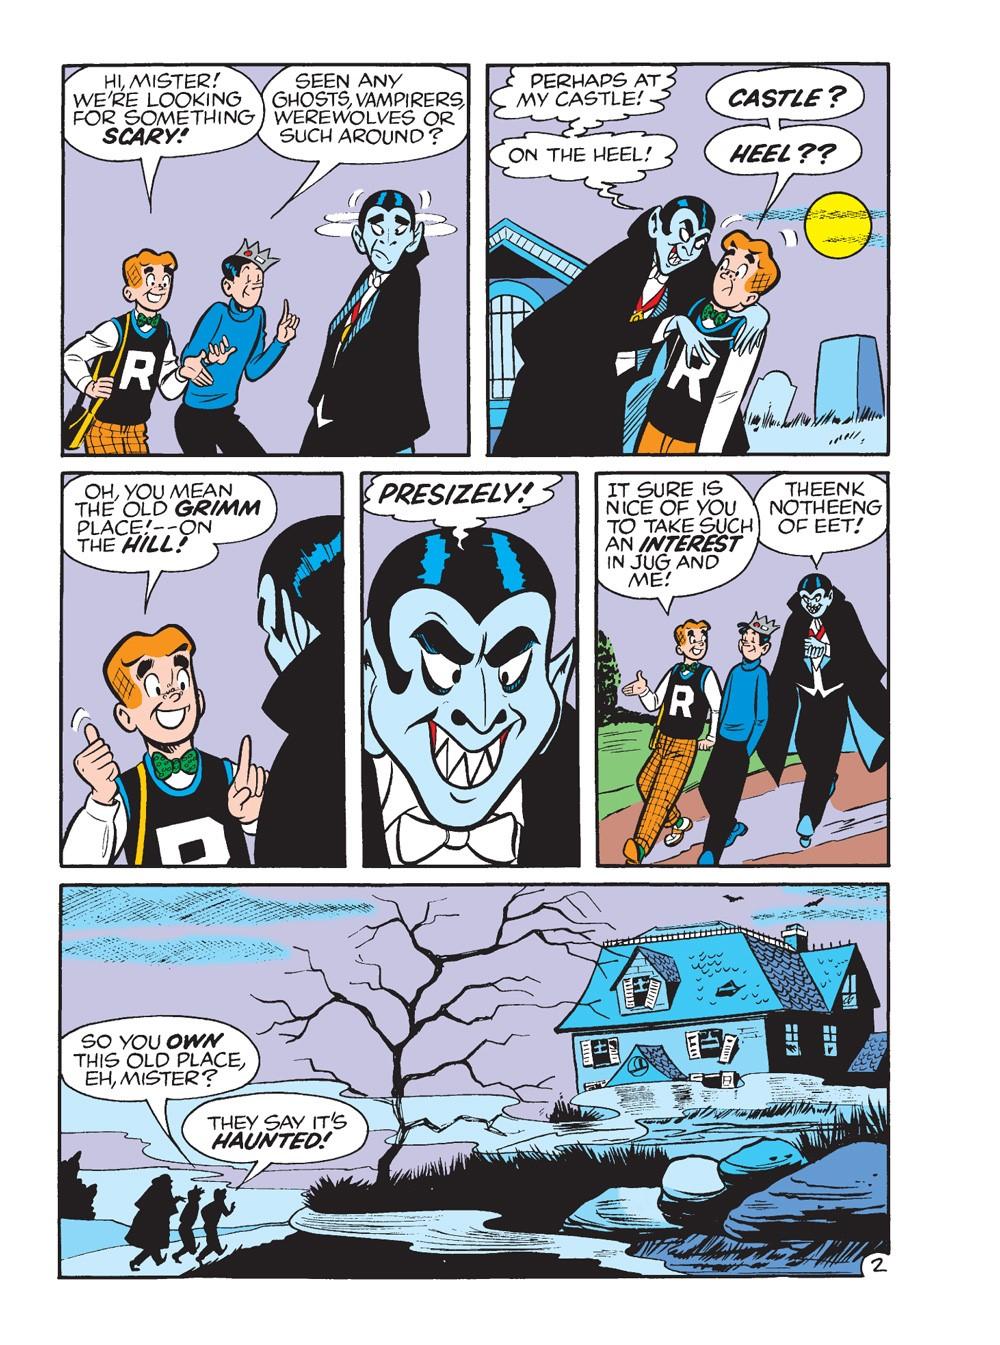 WorldOfArchieJumboComicsDigest_113-63 ComicList Previews: WORLD OF ARCHIE JUMBO COMICS DIGEST #113